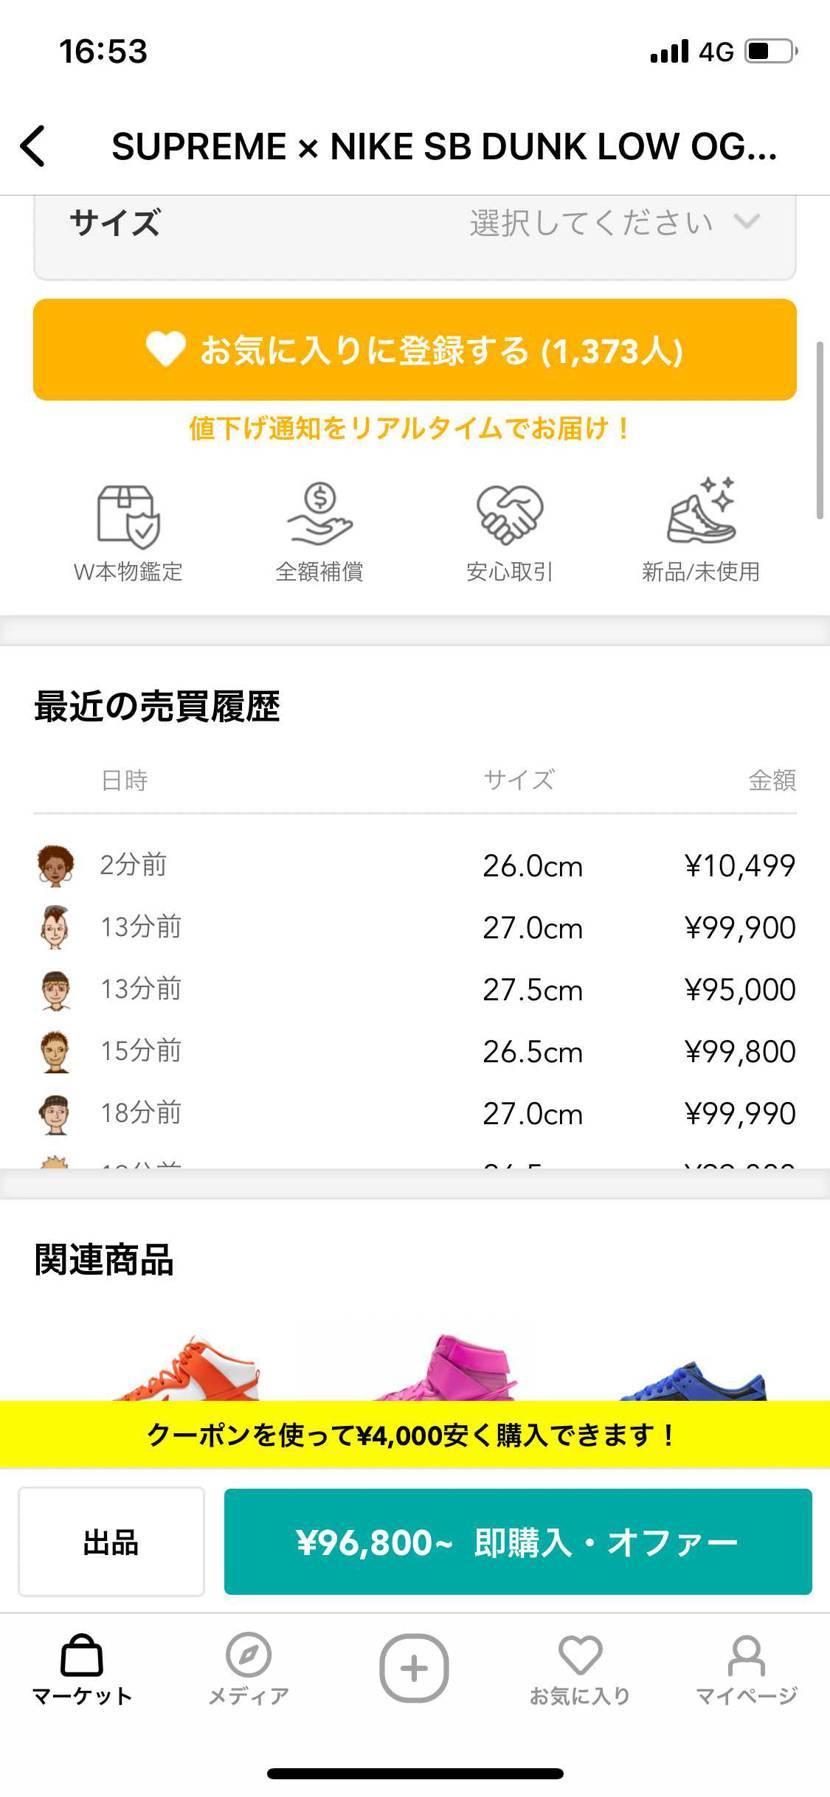 10499円!?!?😂